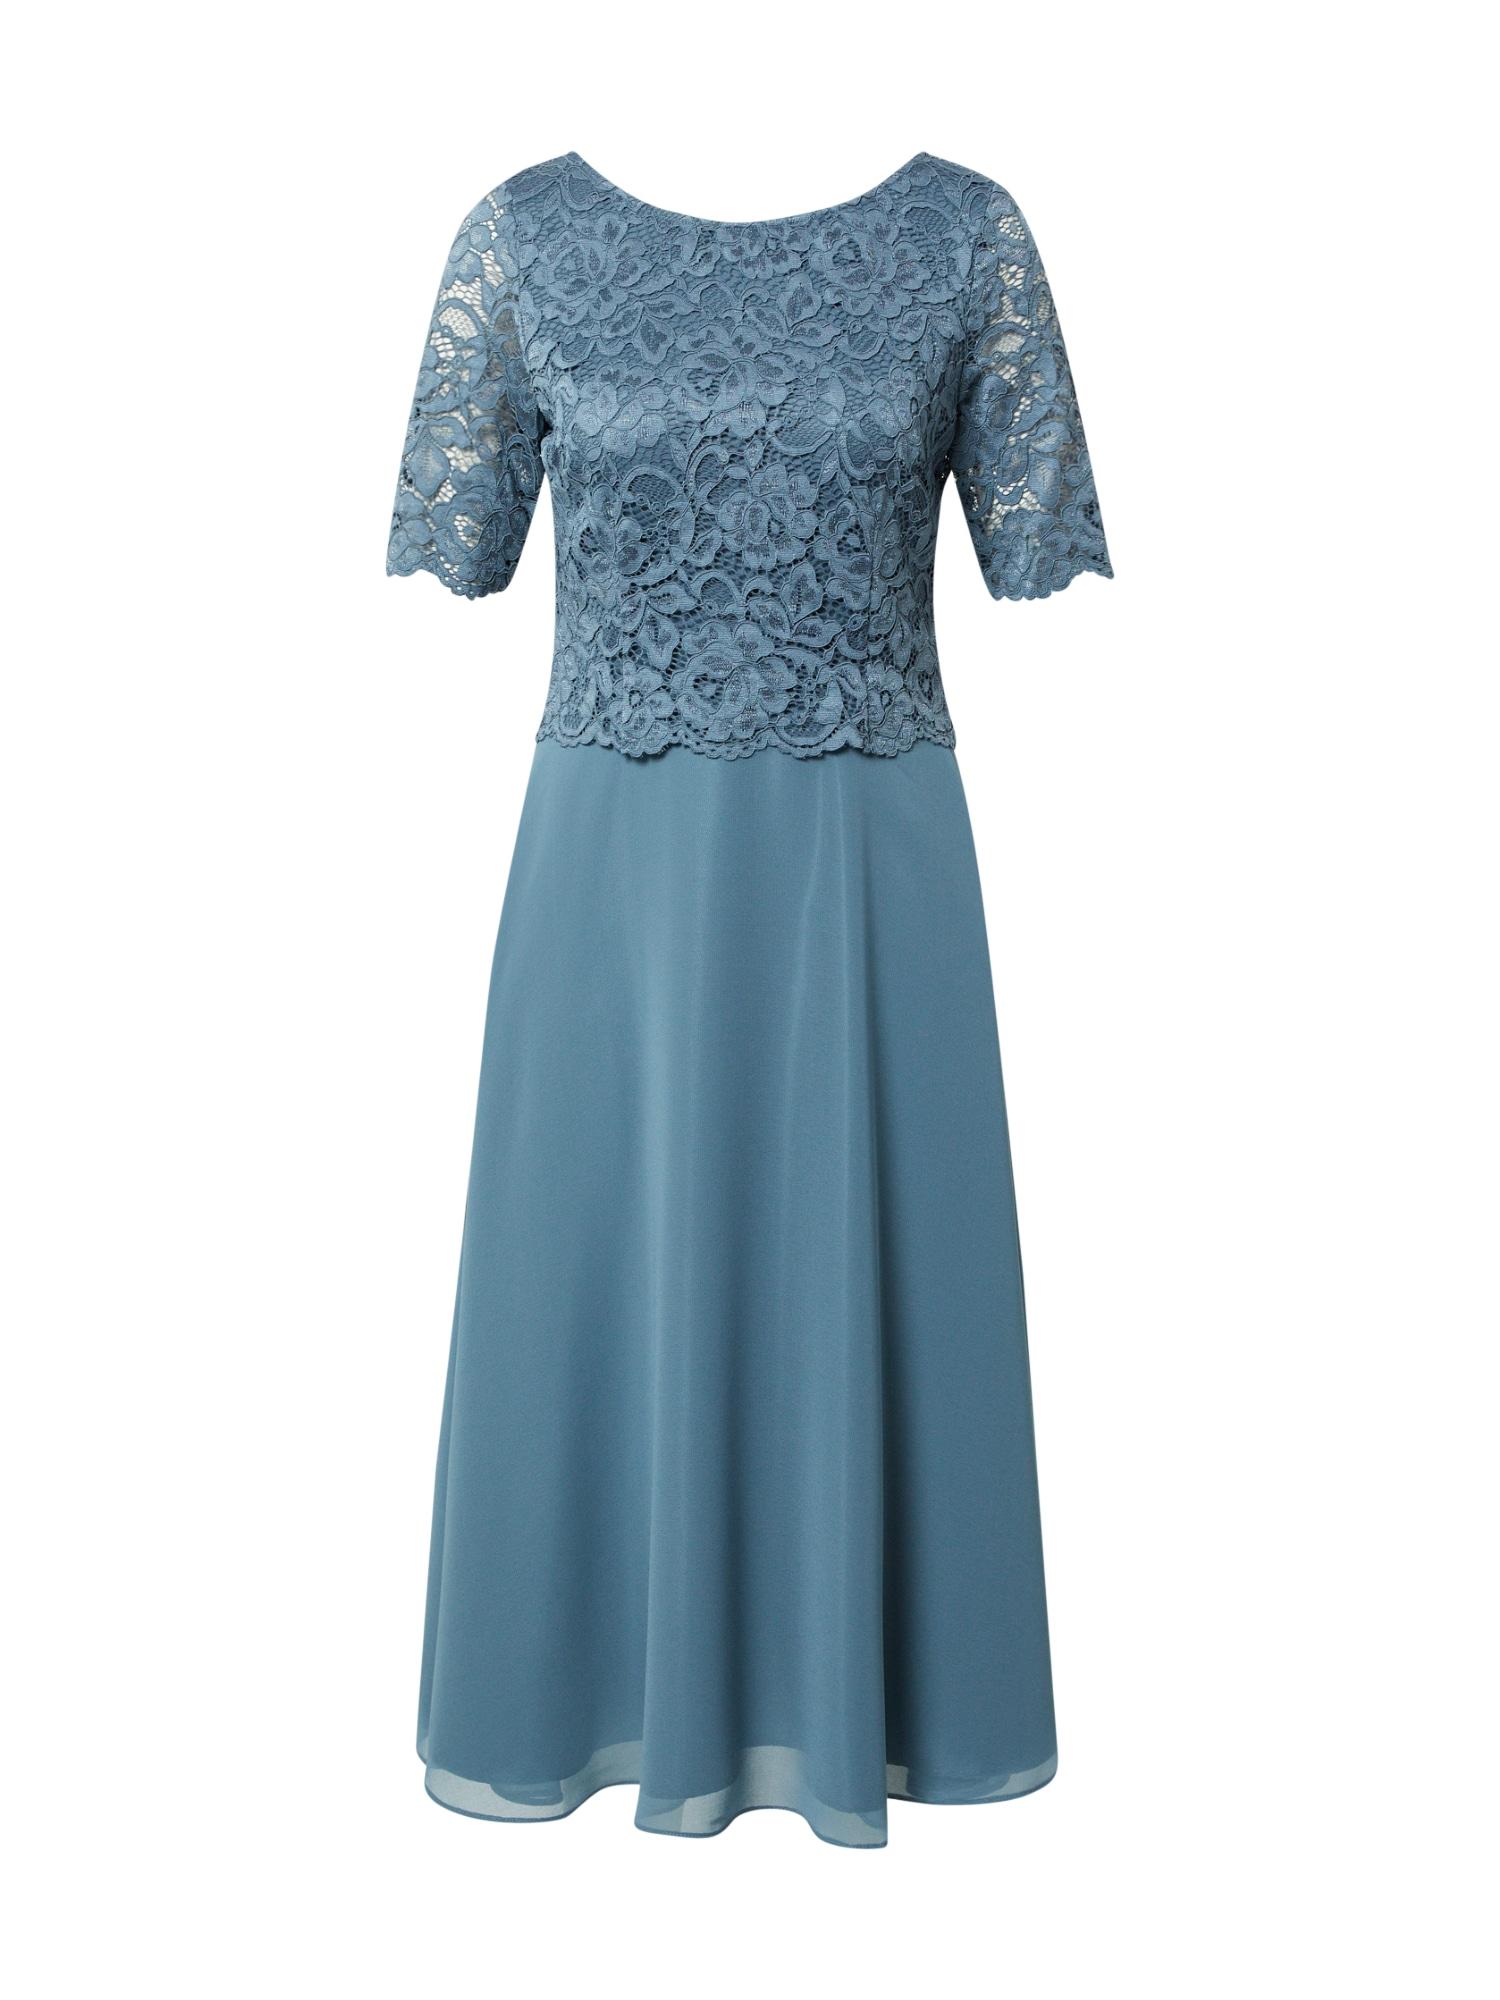 Vera Mont Kokteilinė suknelė mėlyna dūmų spalva